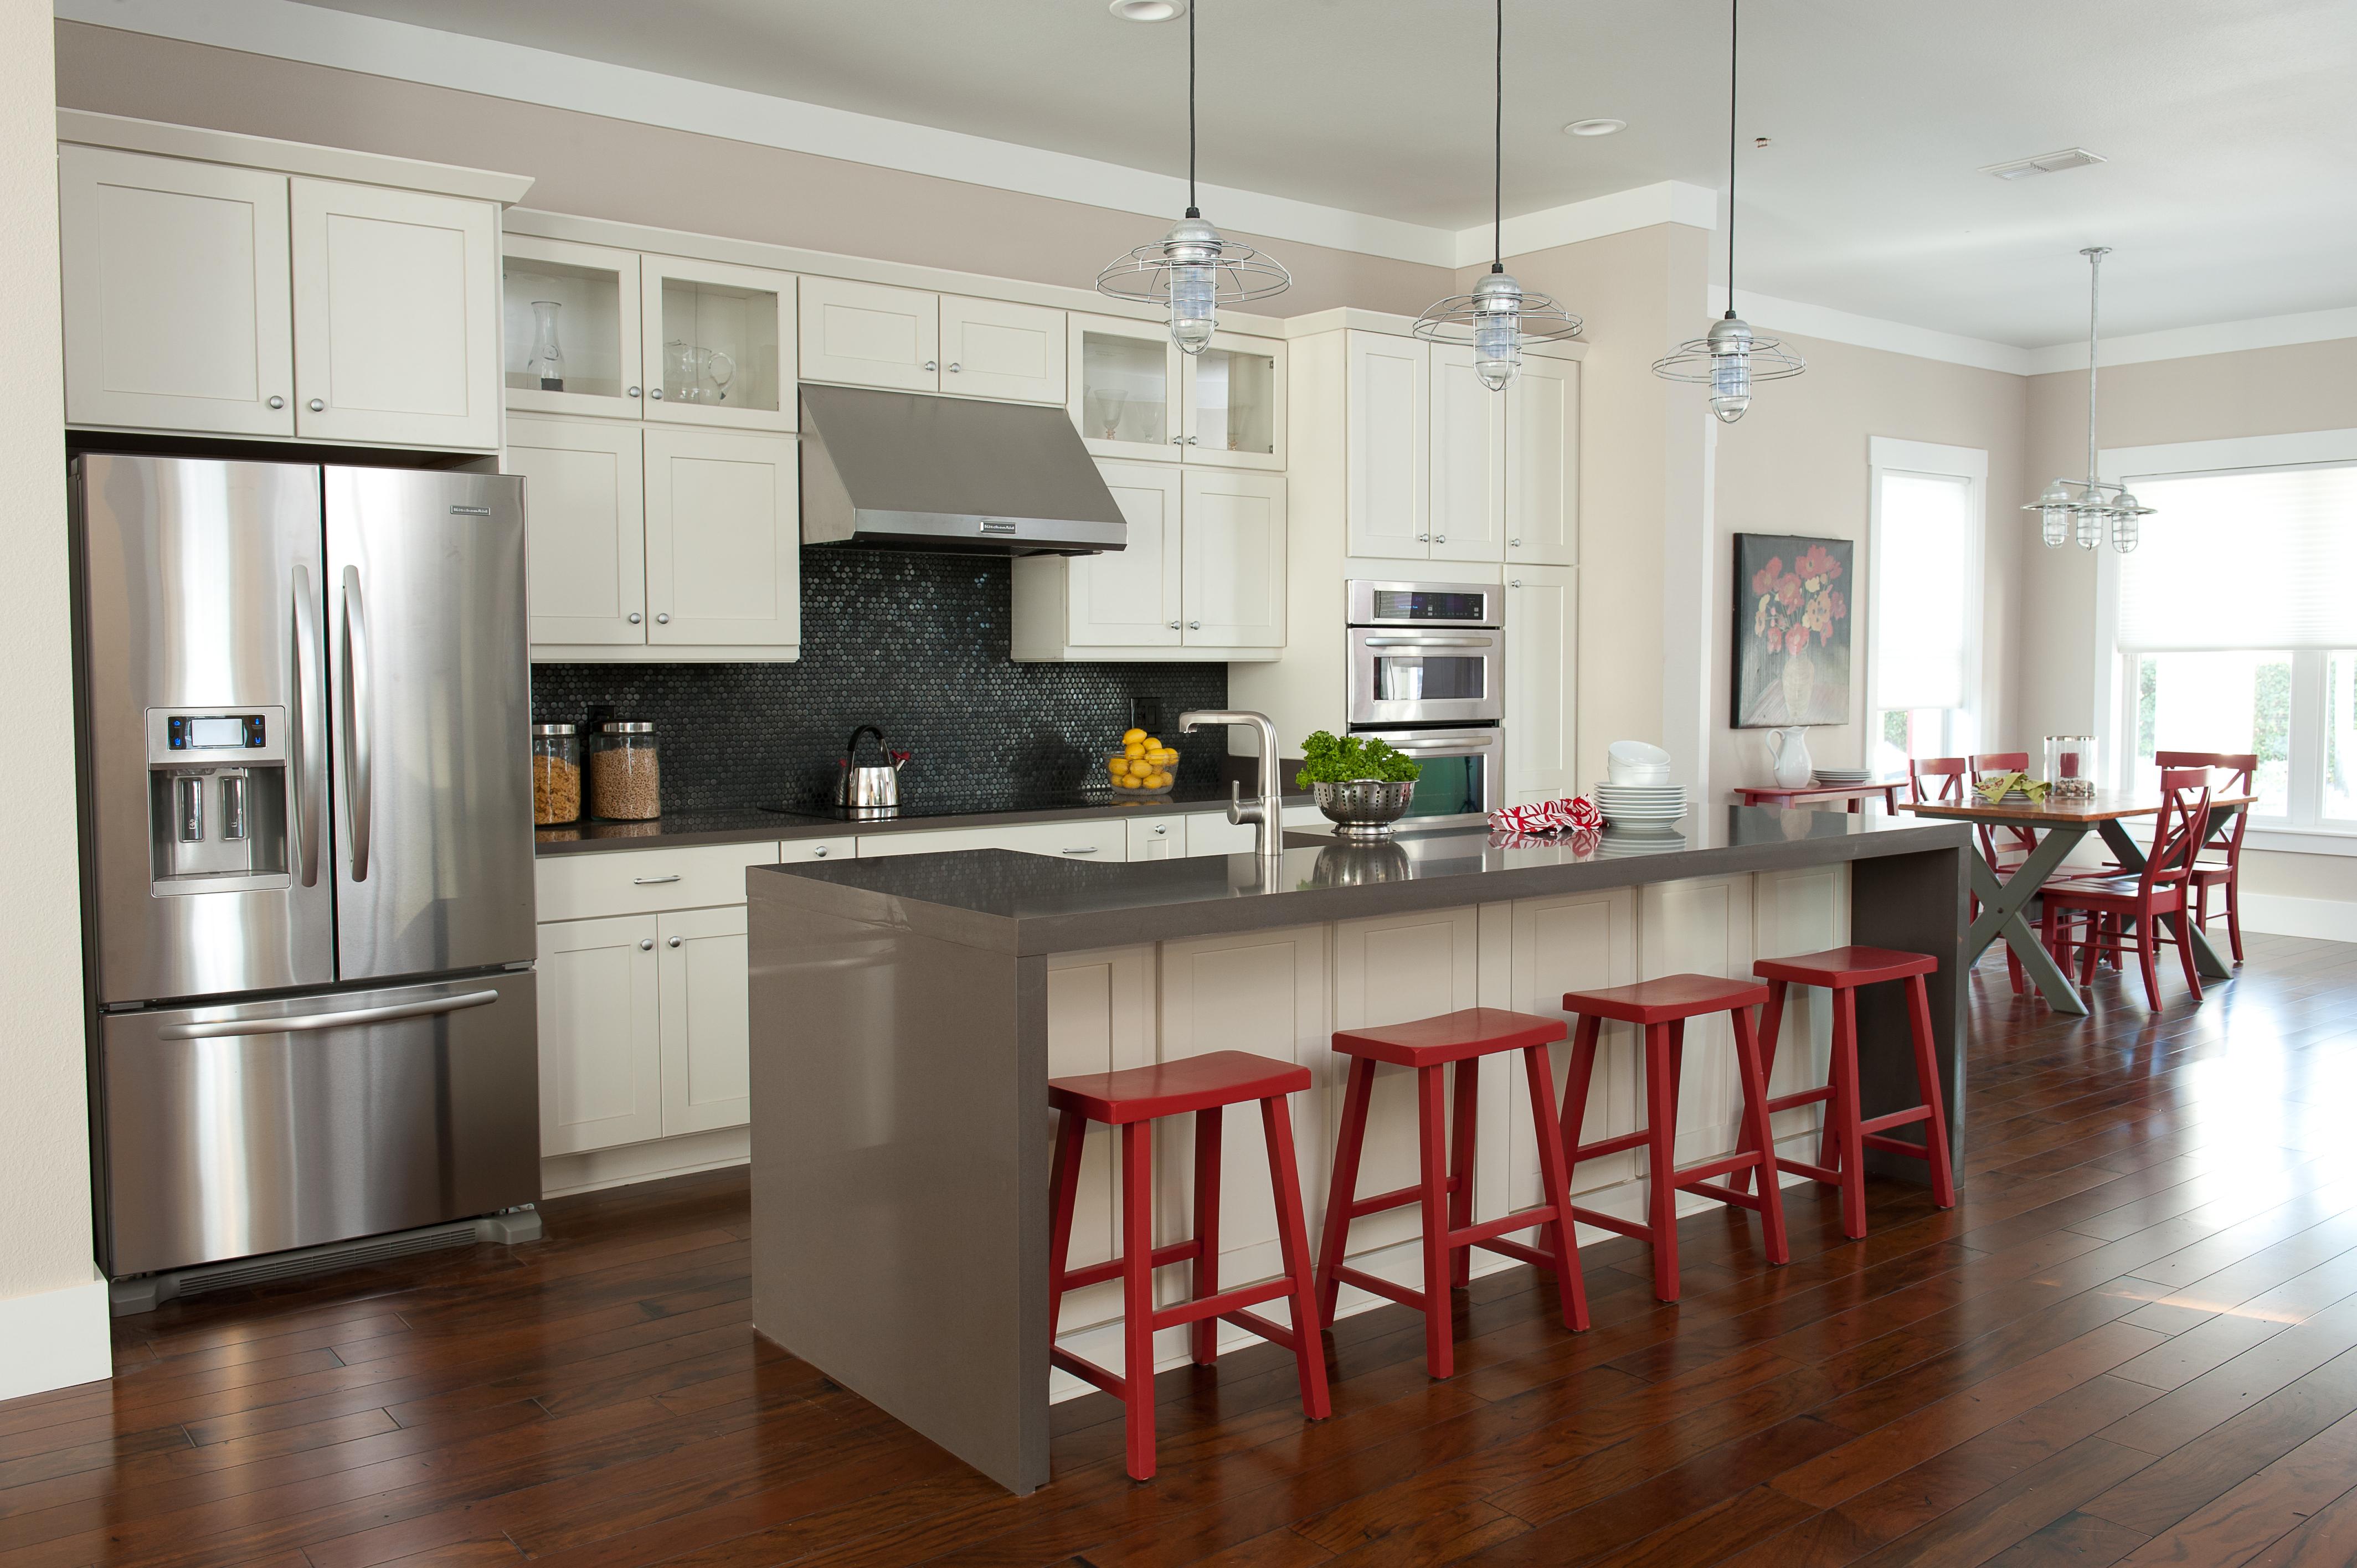 VISION House Orlando Kitchen